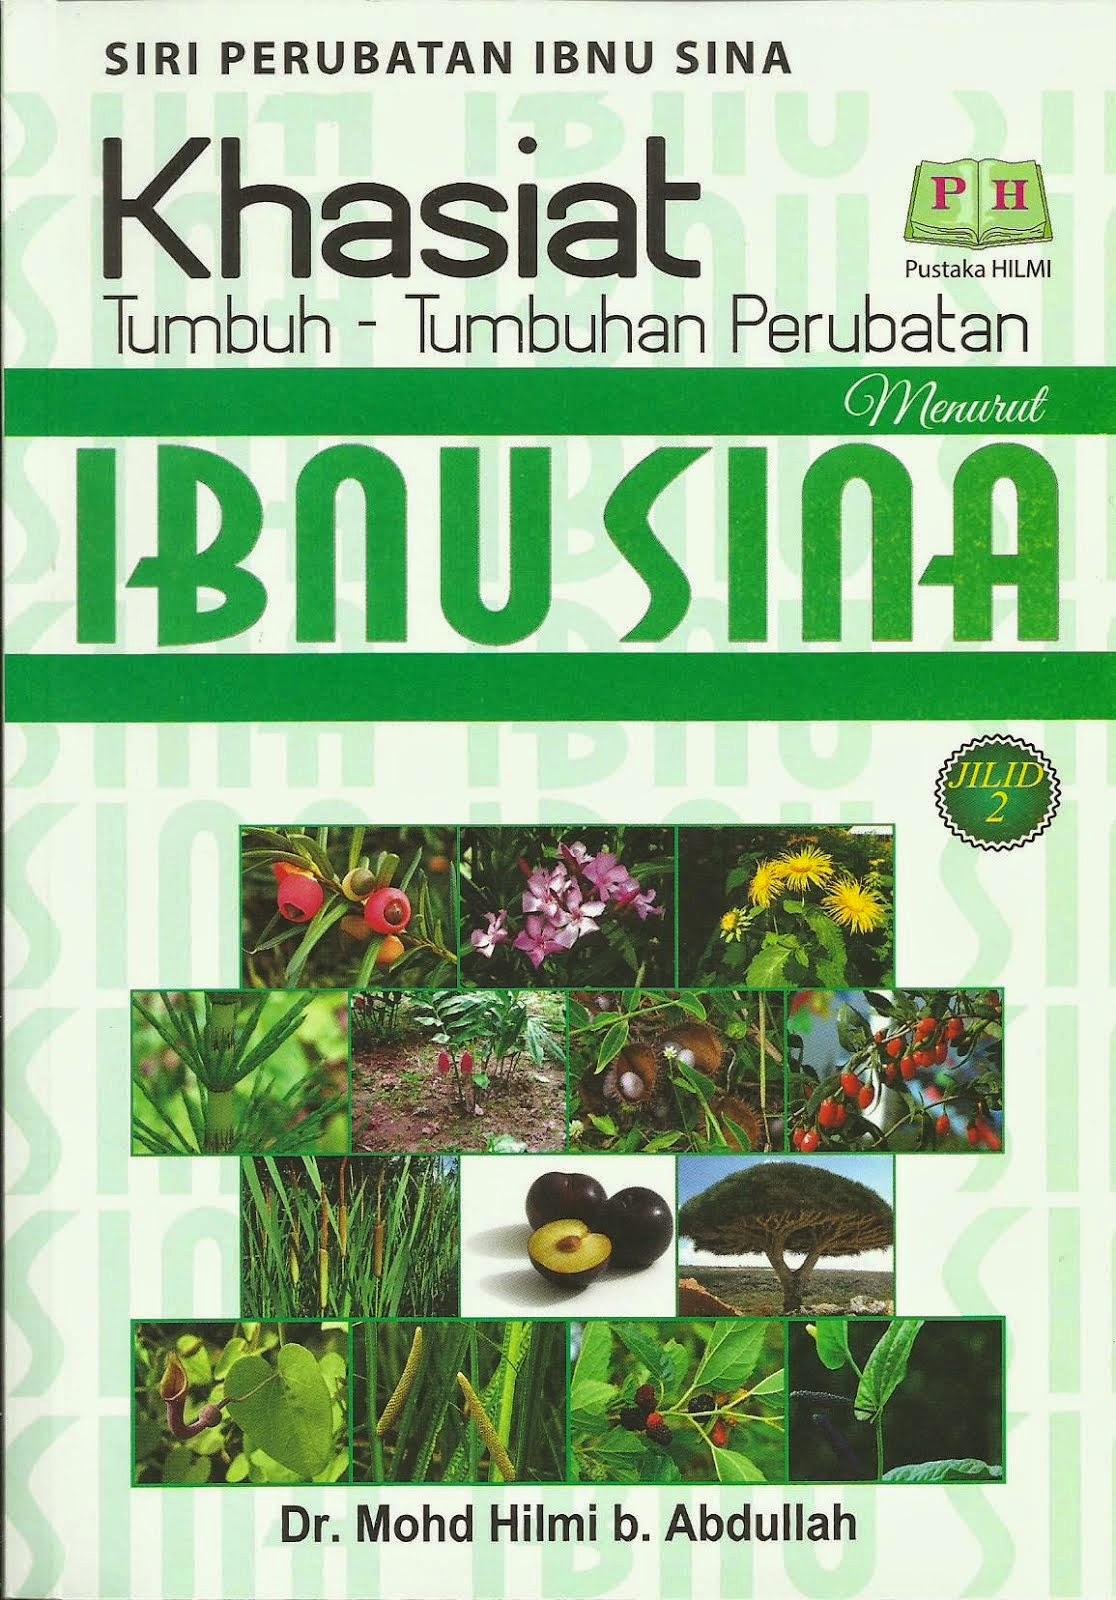 Khasiat Tumbuh-Tumbuhan Perubatan Menurut Ibnu Sina (Jilid 2)